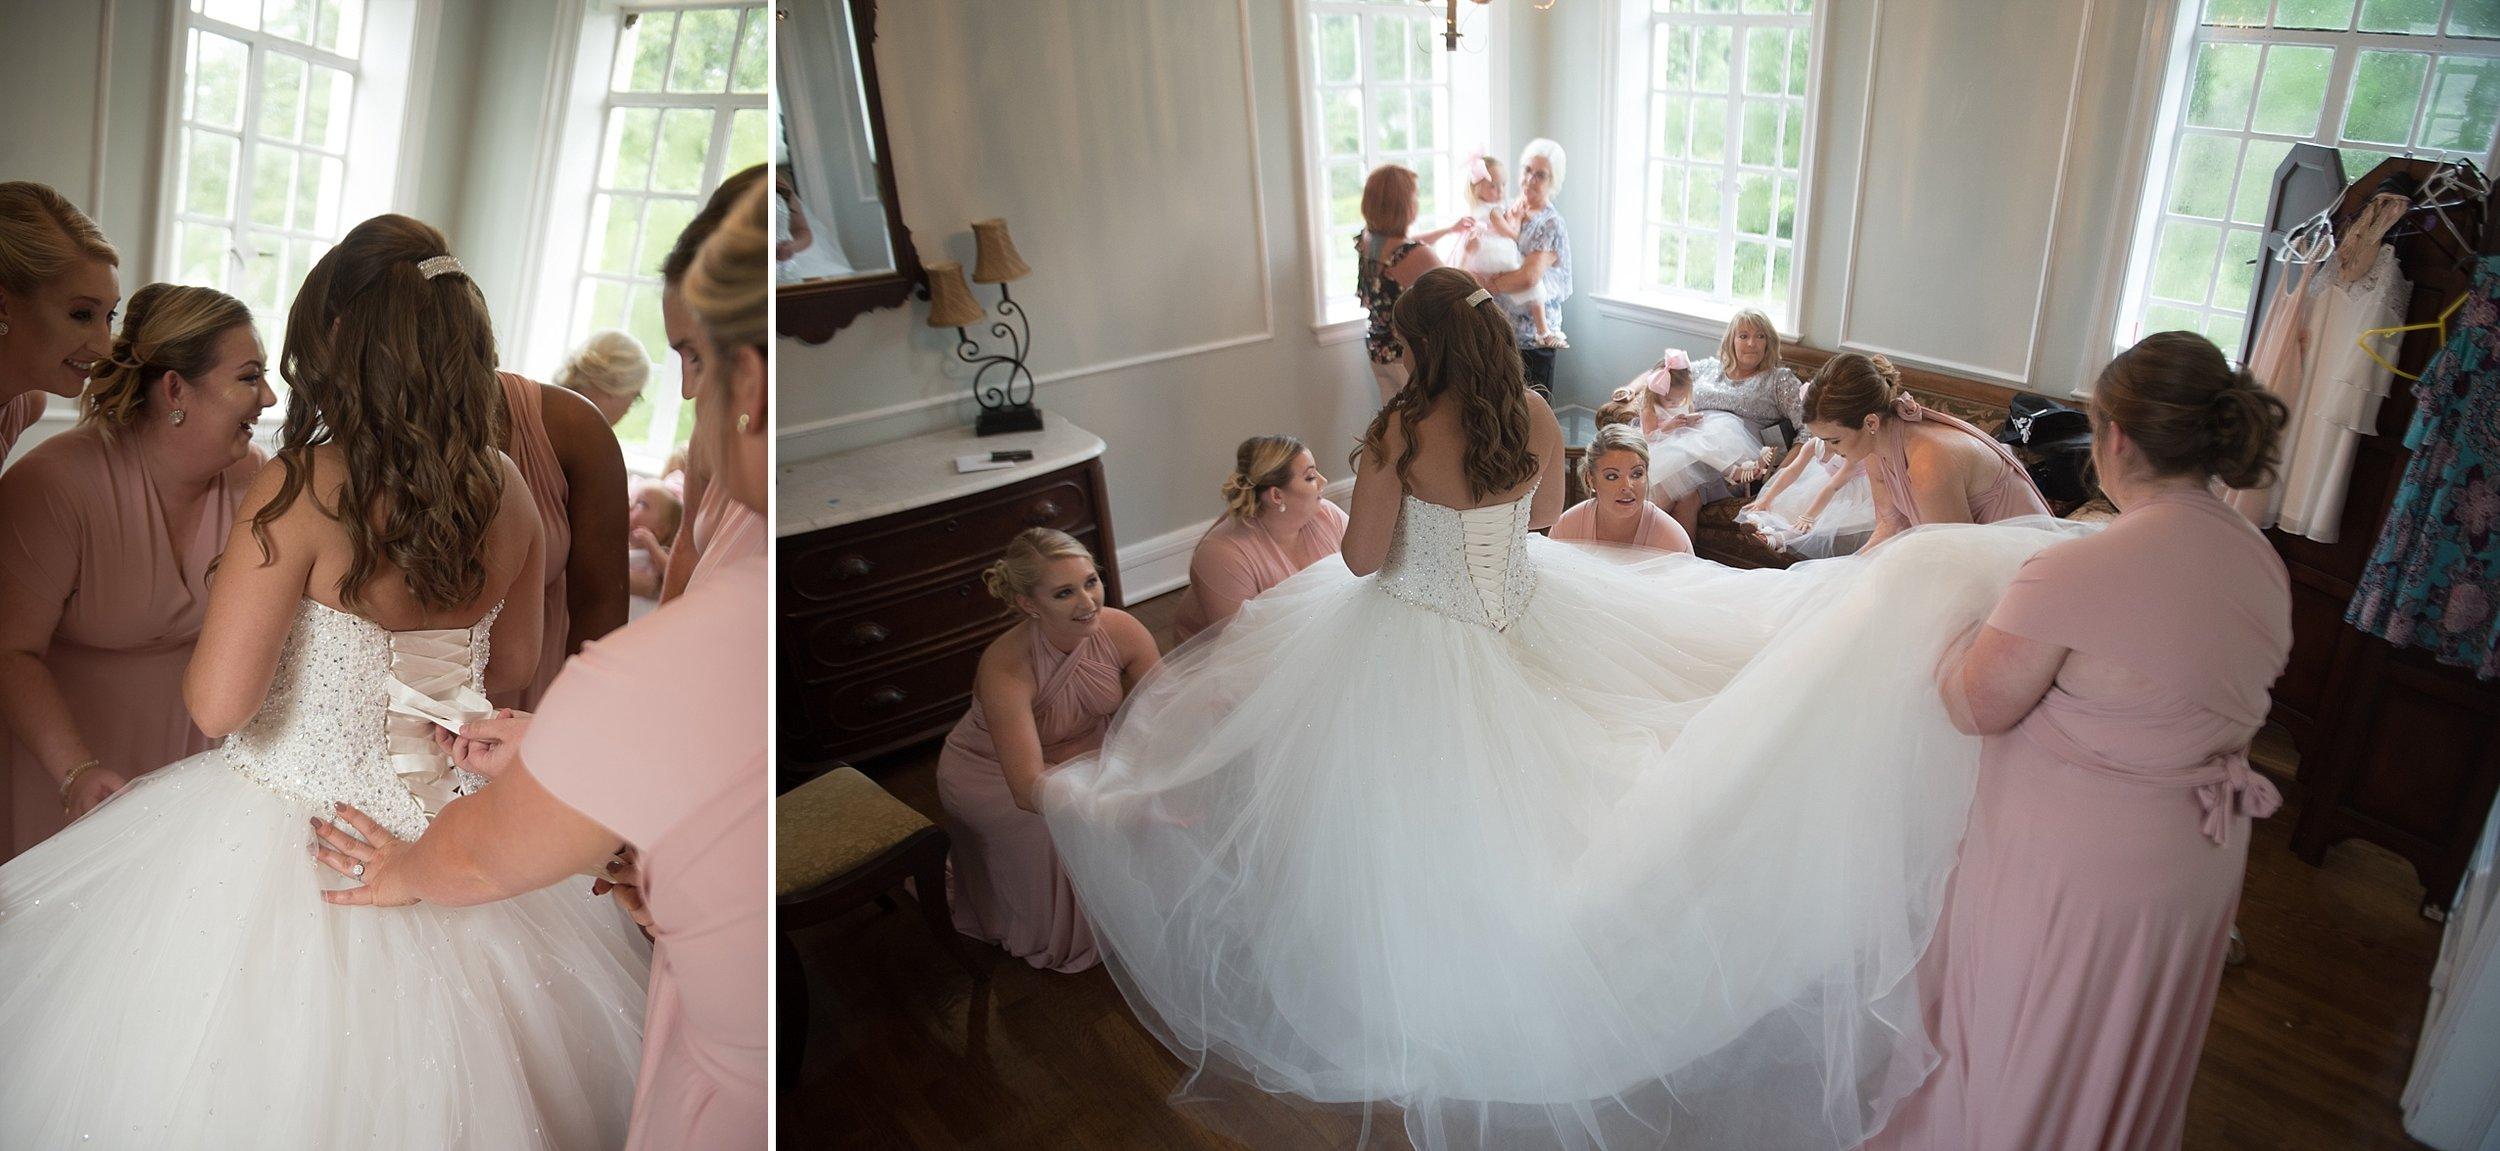 Bridesmaids help bride lace up her ballgown wedding dress